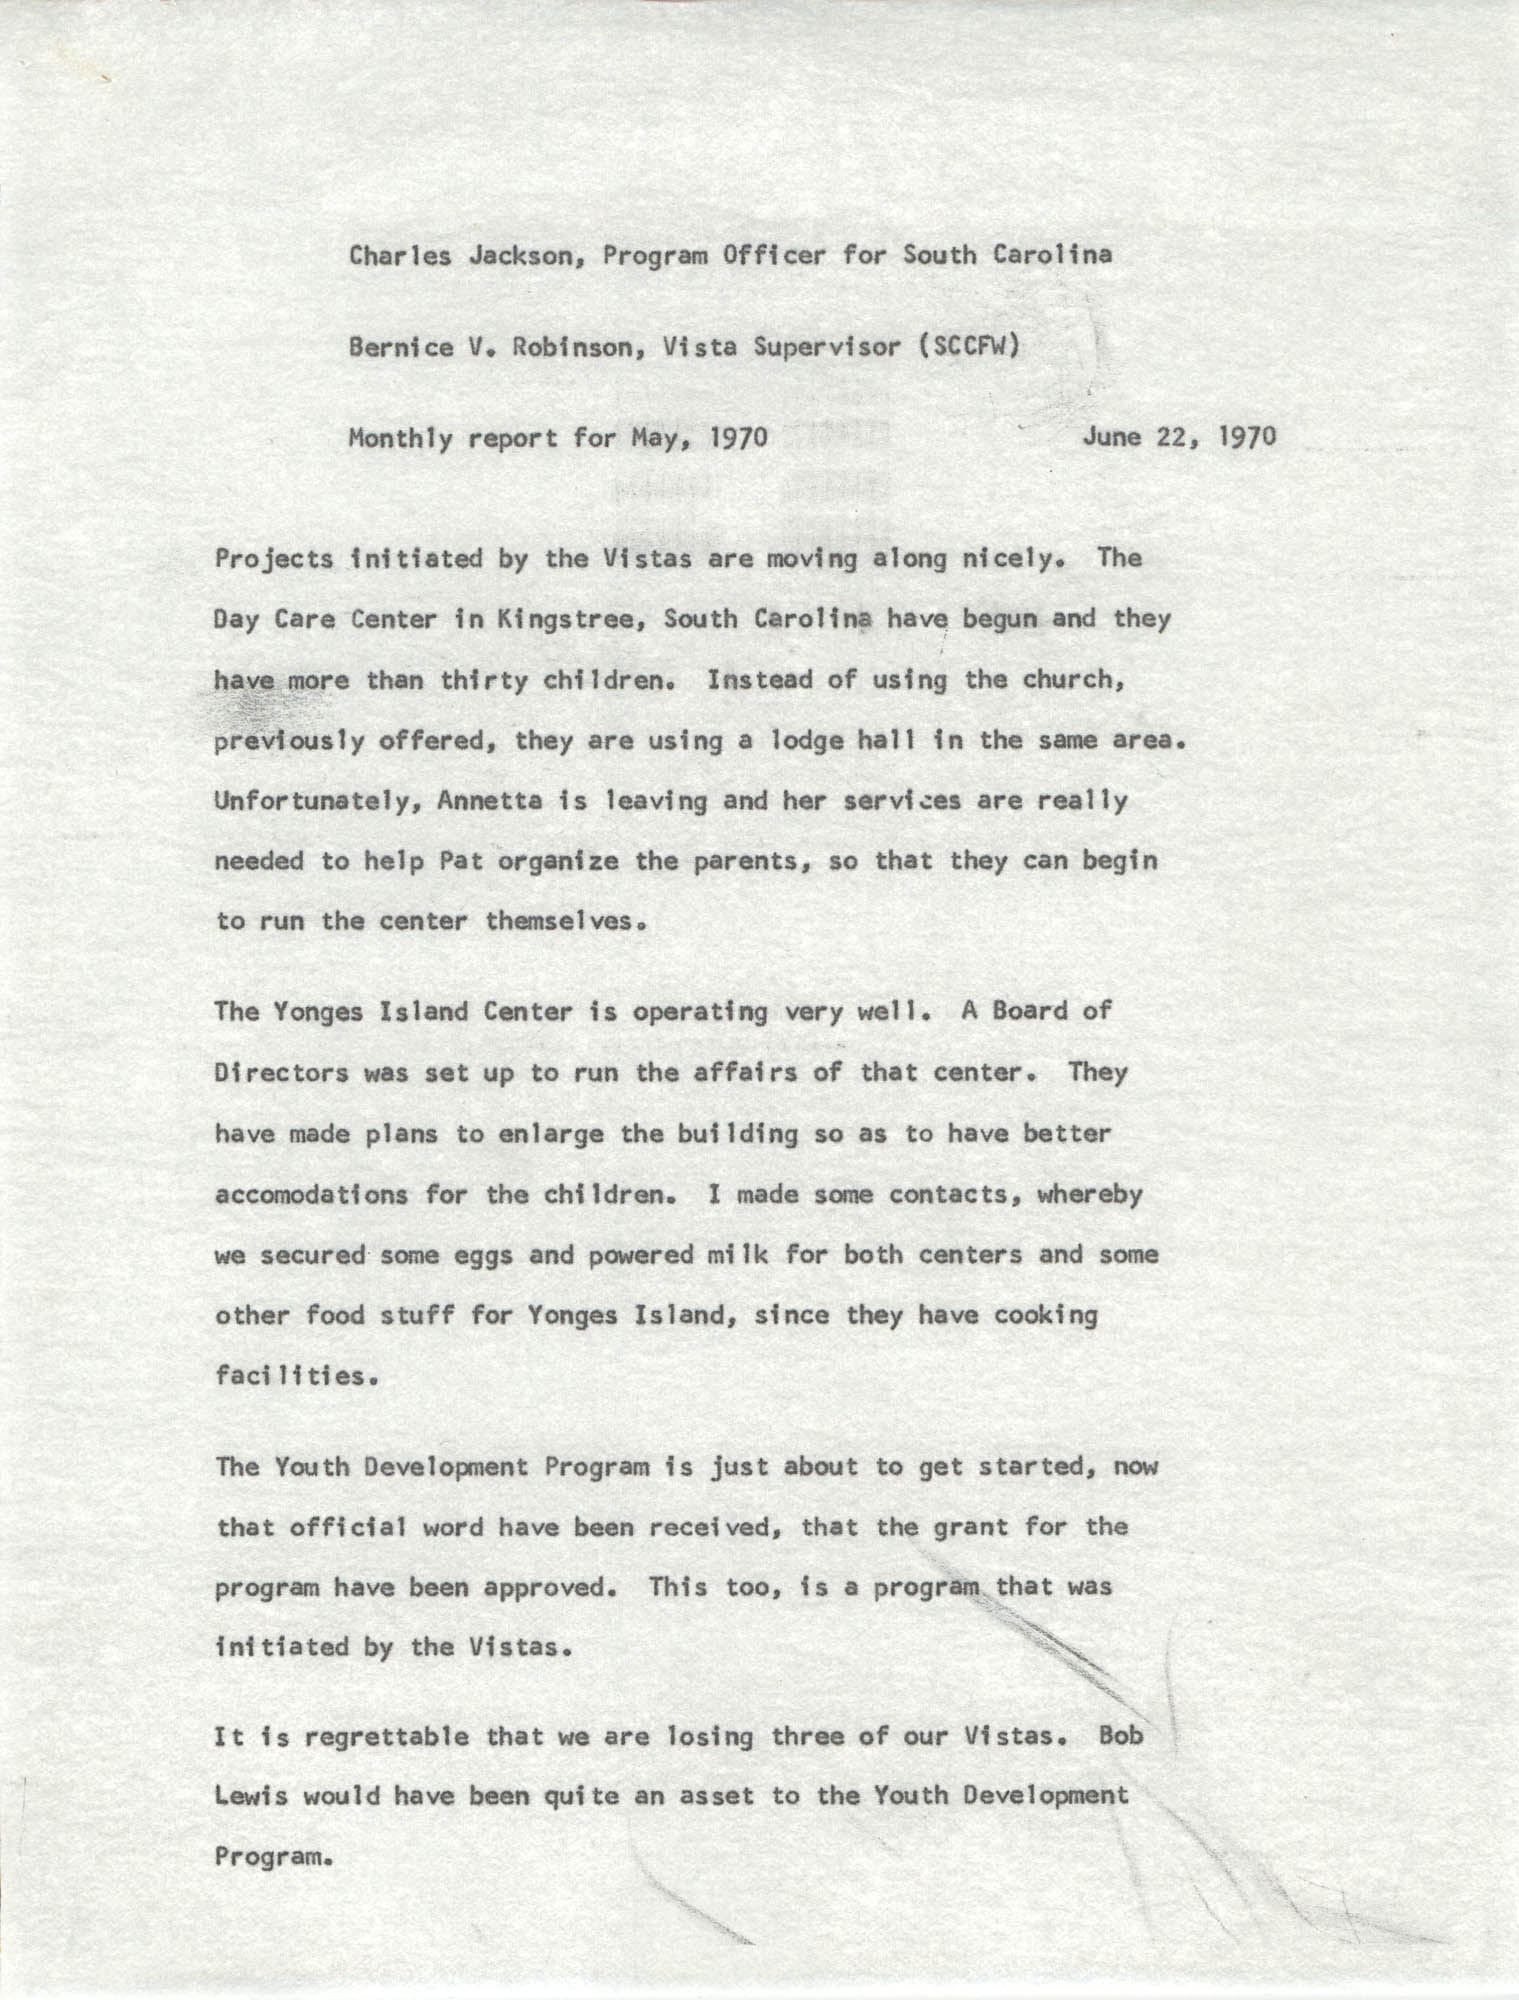 VISTA Memorandum, Monthly Progress Report, May 1970